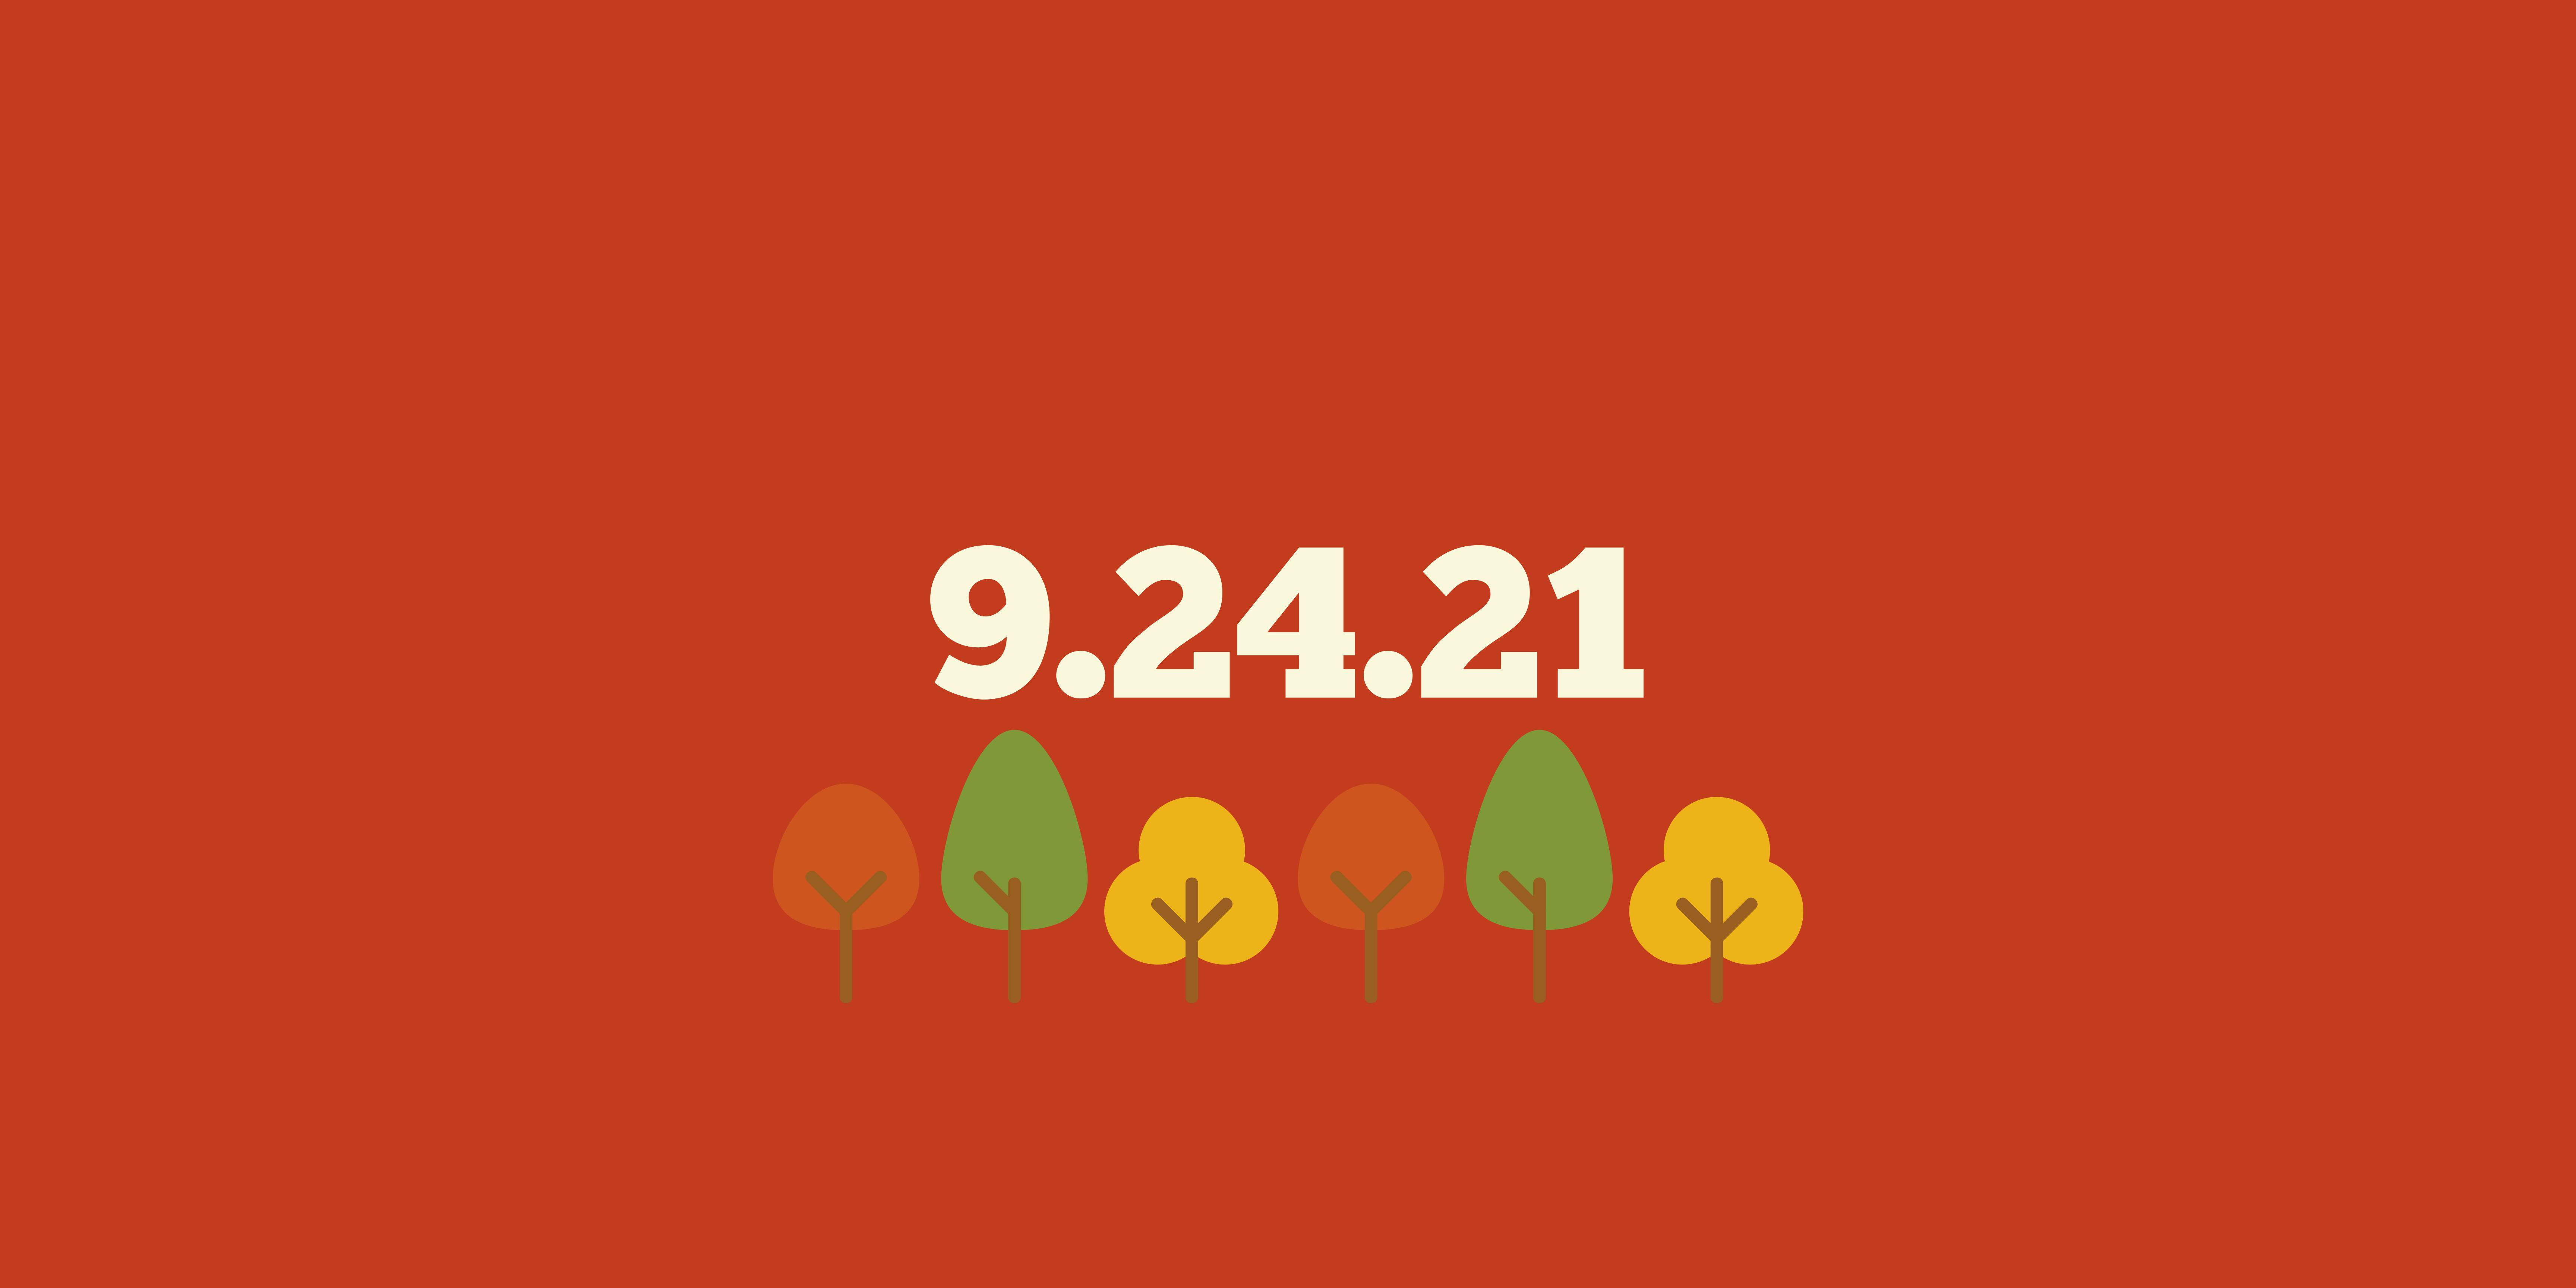 9.24.21